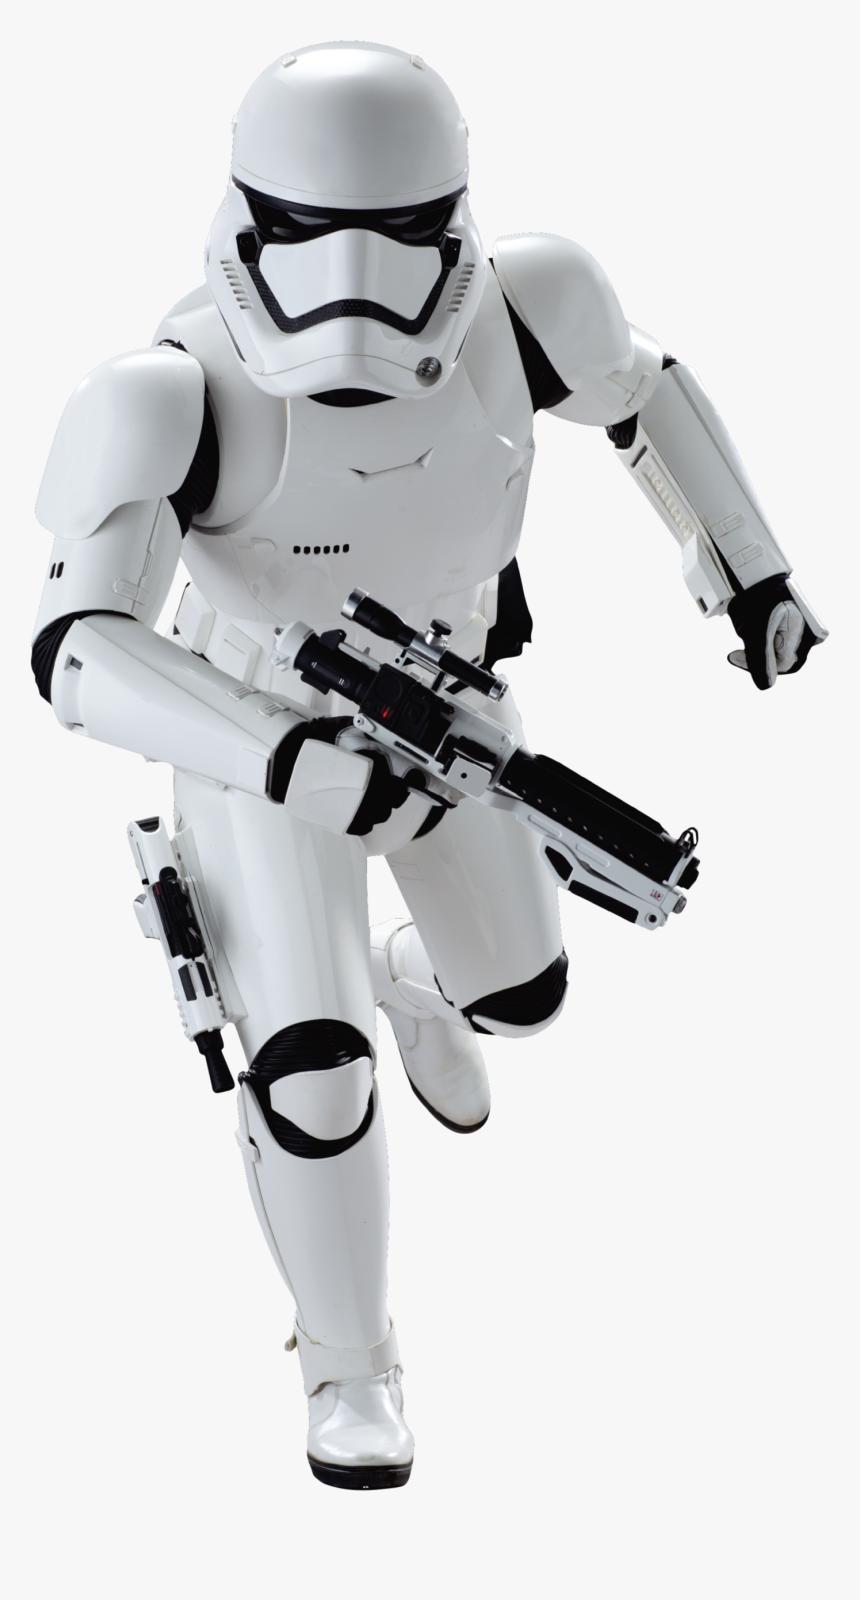 Thumb Image - Star Wars Stormtrooper Png, Transparent Png, Free Download